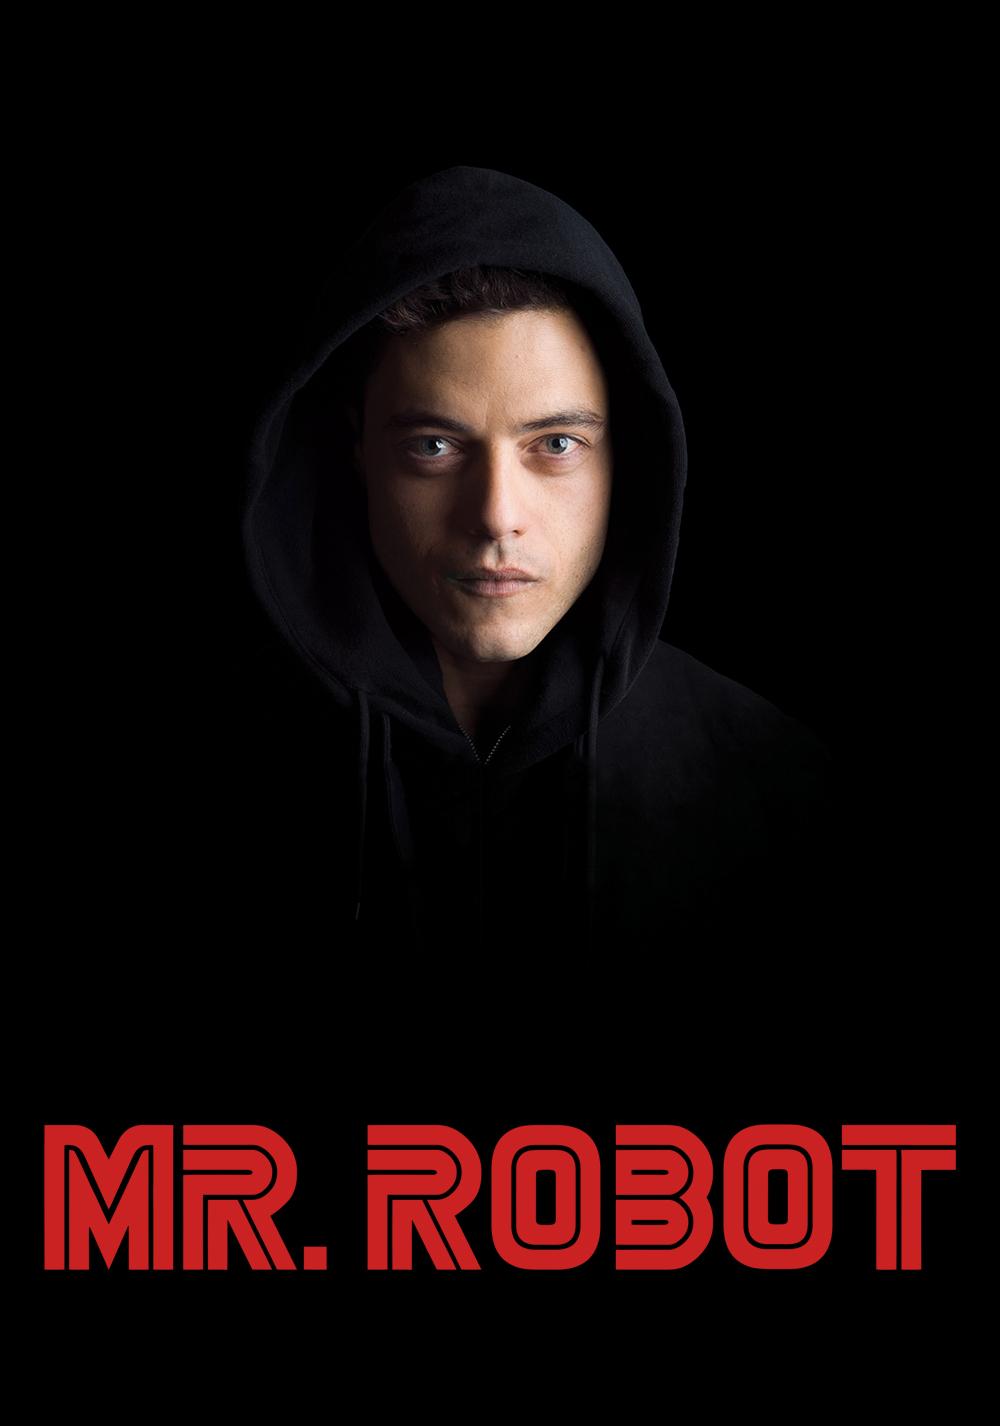 mr-robot-55682c155114b.jpg